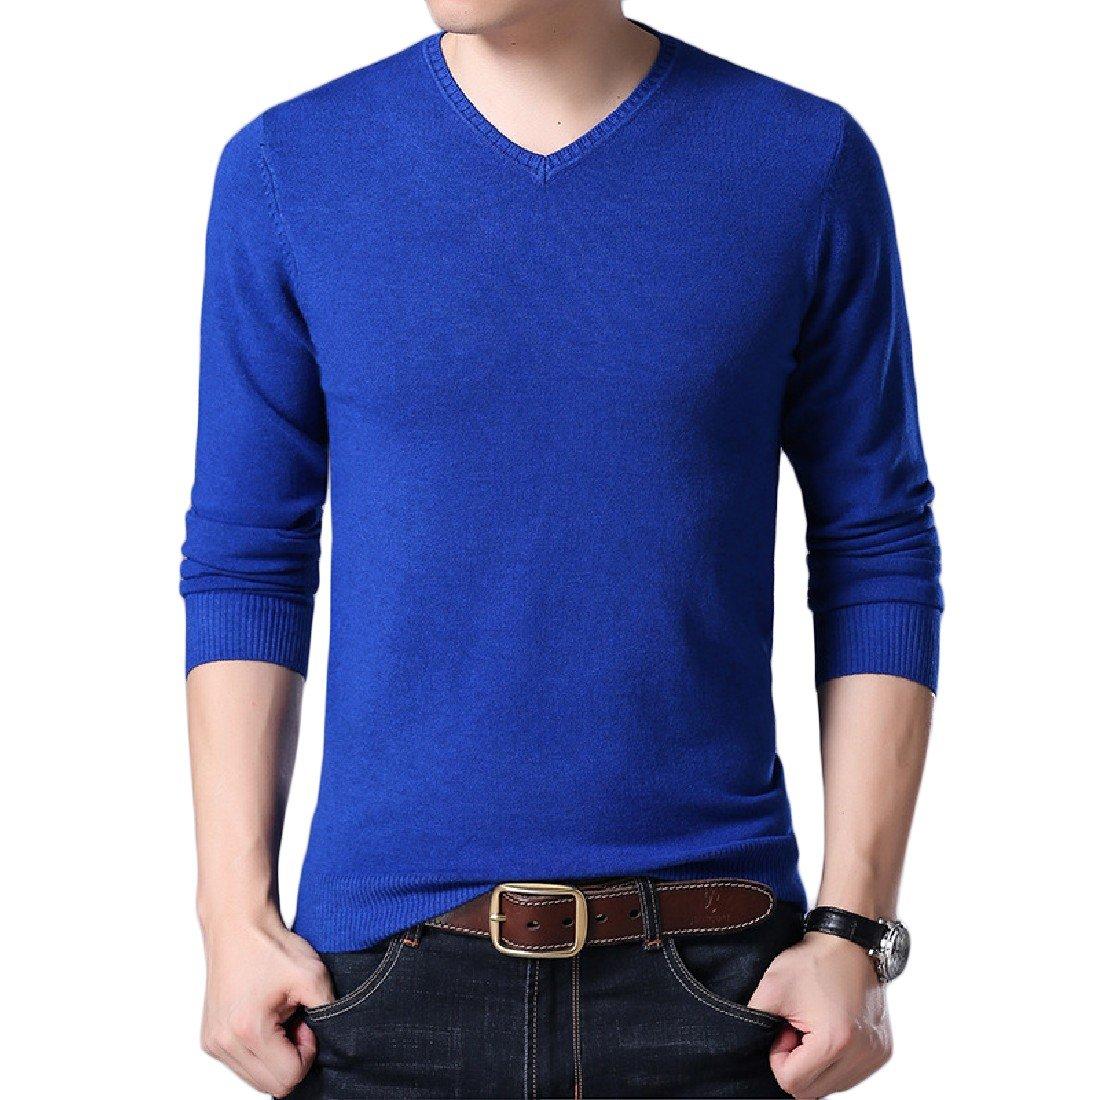 SportsX Mens All-Match Knit Plus Size Autumn Long Sleeve Tshirt Tops Tees